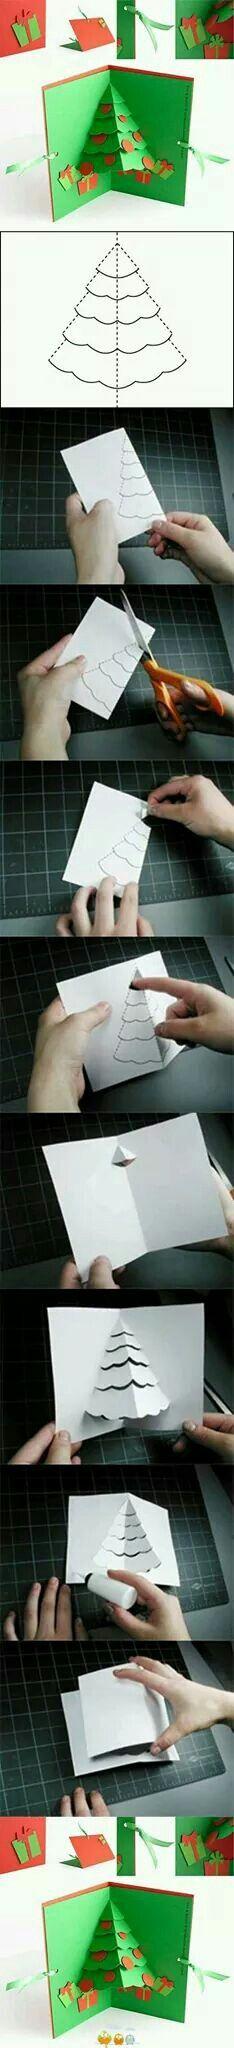 tarjeta paso a paso